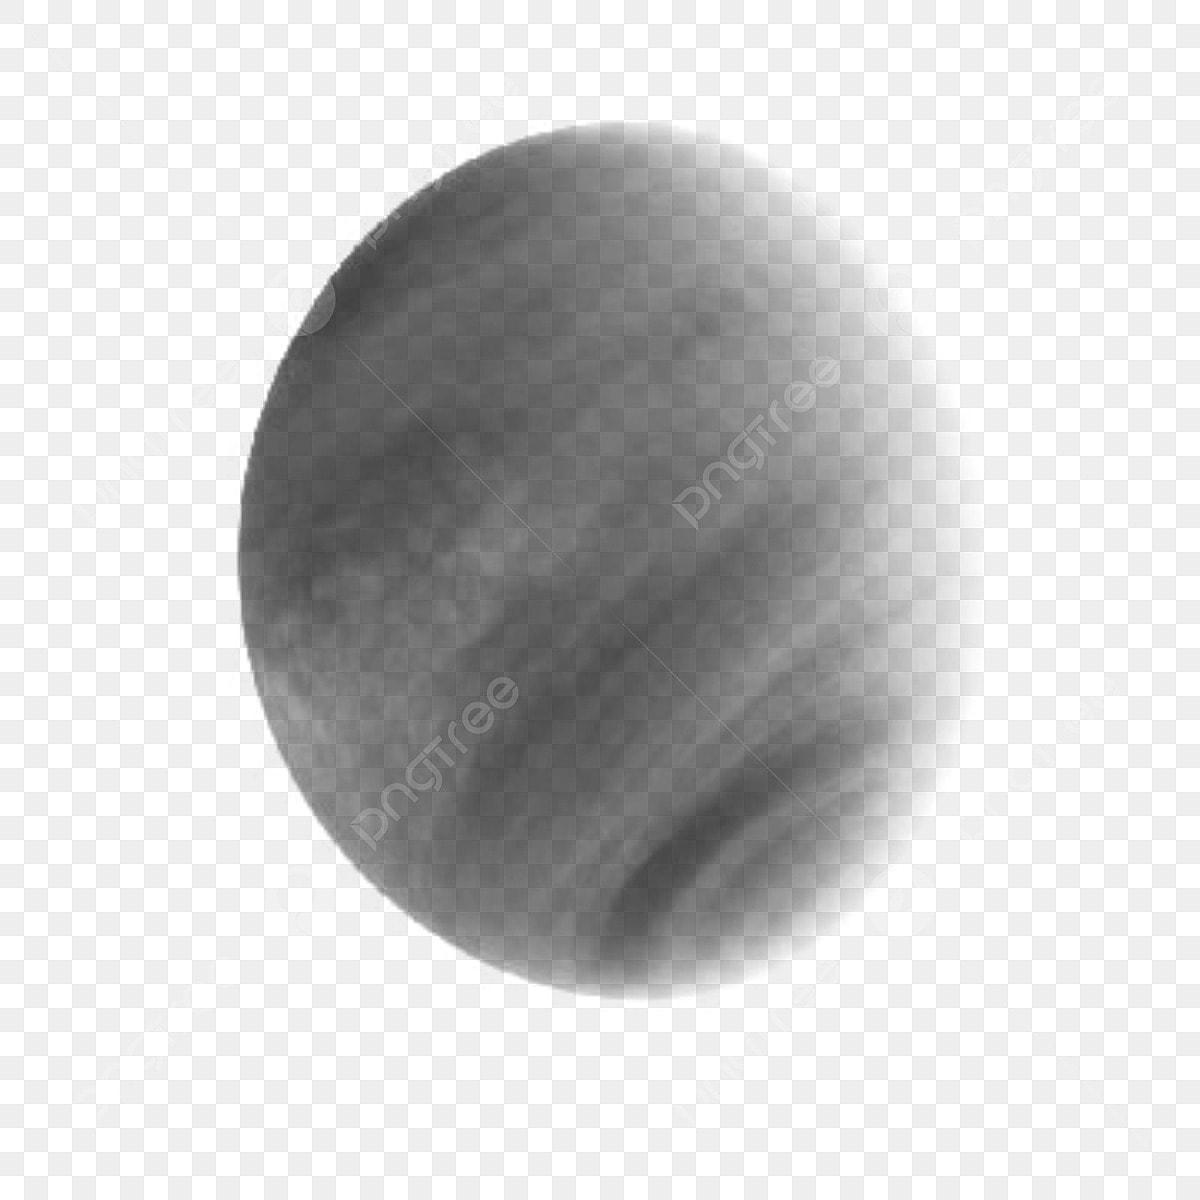 Full Moon Clipart Moon Png Hd Transparent Moon Png Clipart